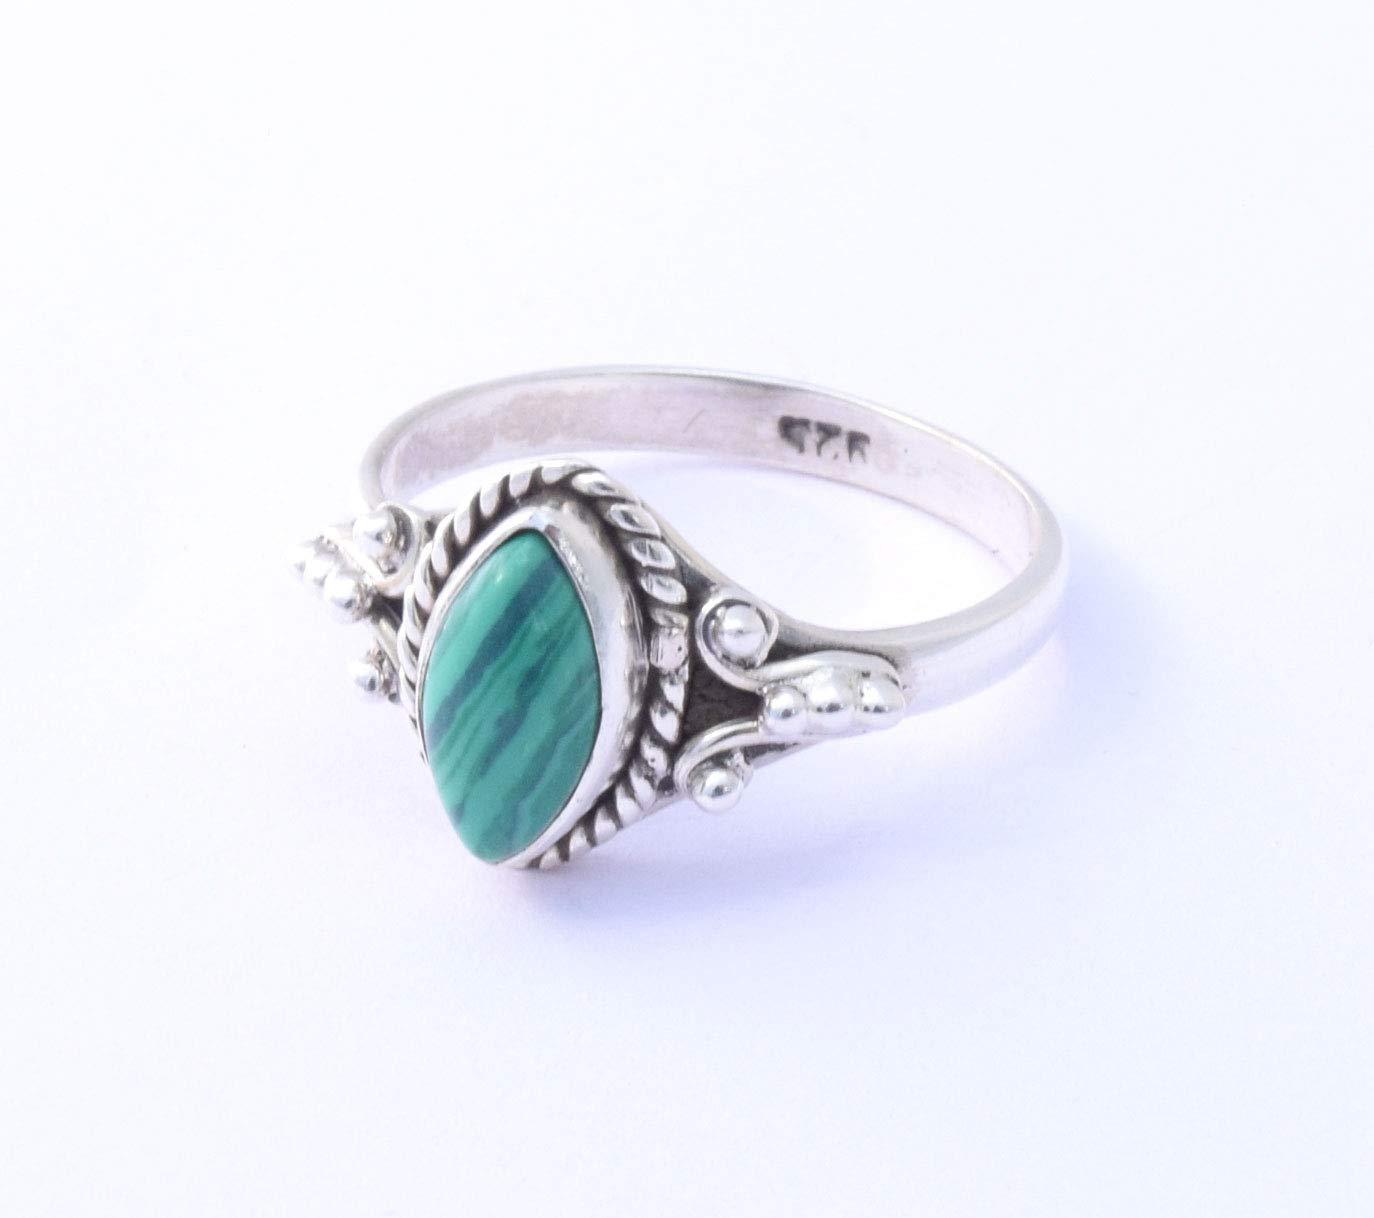 Malachite Ring Sterling Silver Green Stone Ring Bohemian Ring Elegant Ring Girls Women Ring Promise Ring Designer Ring Anniversary Ring Gift